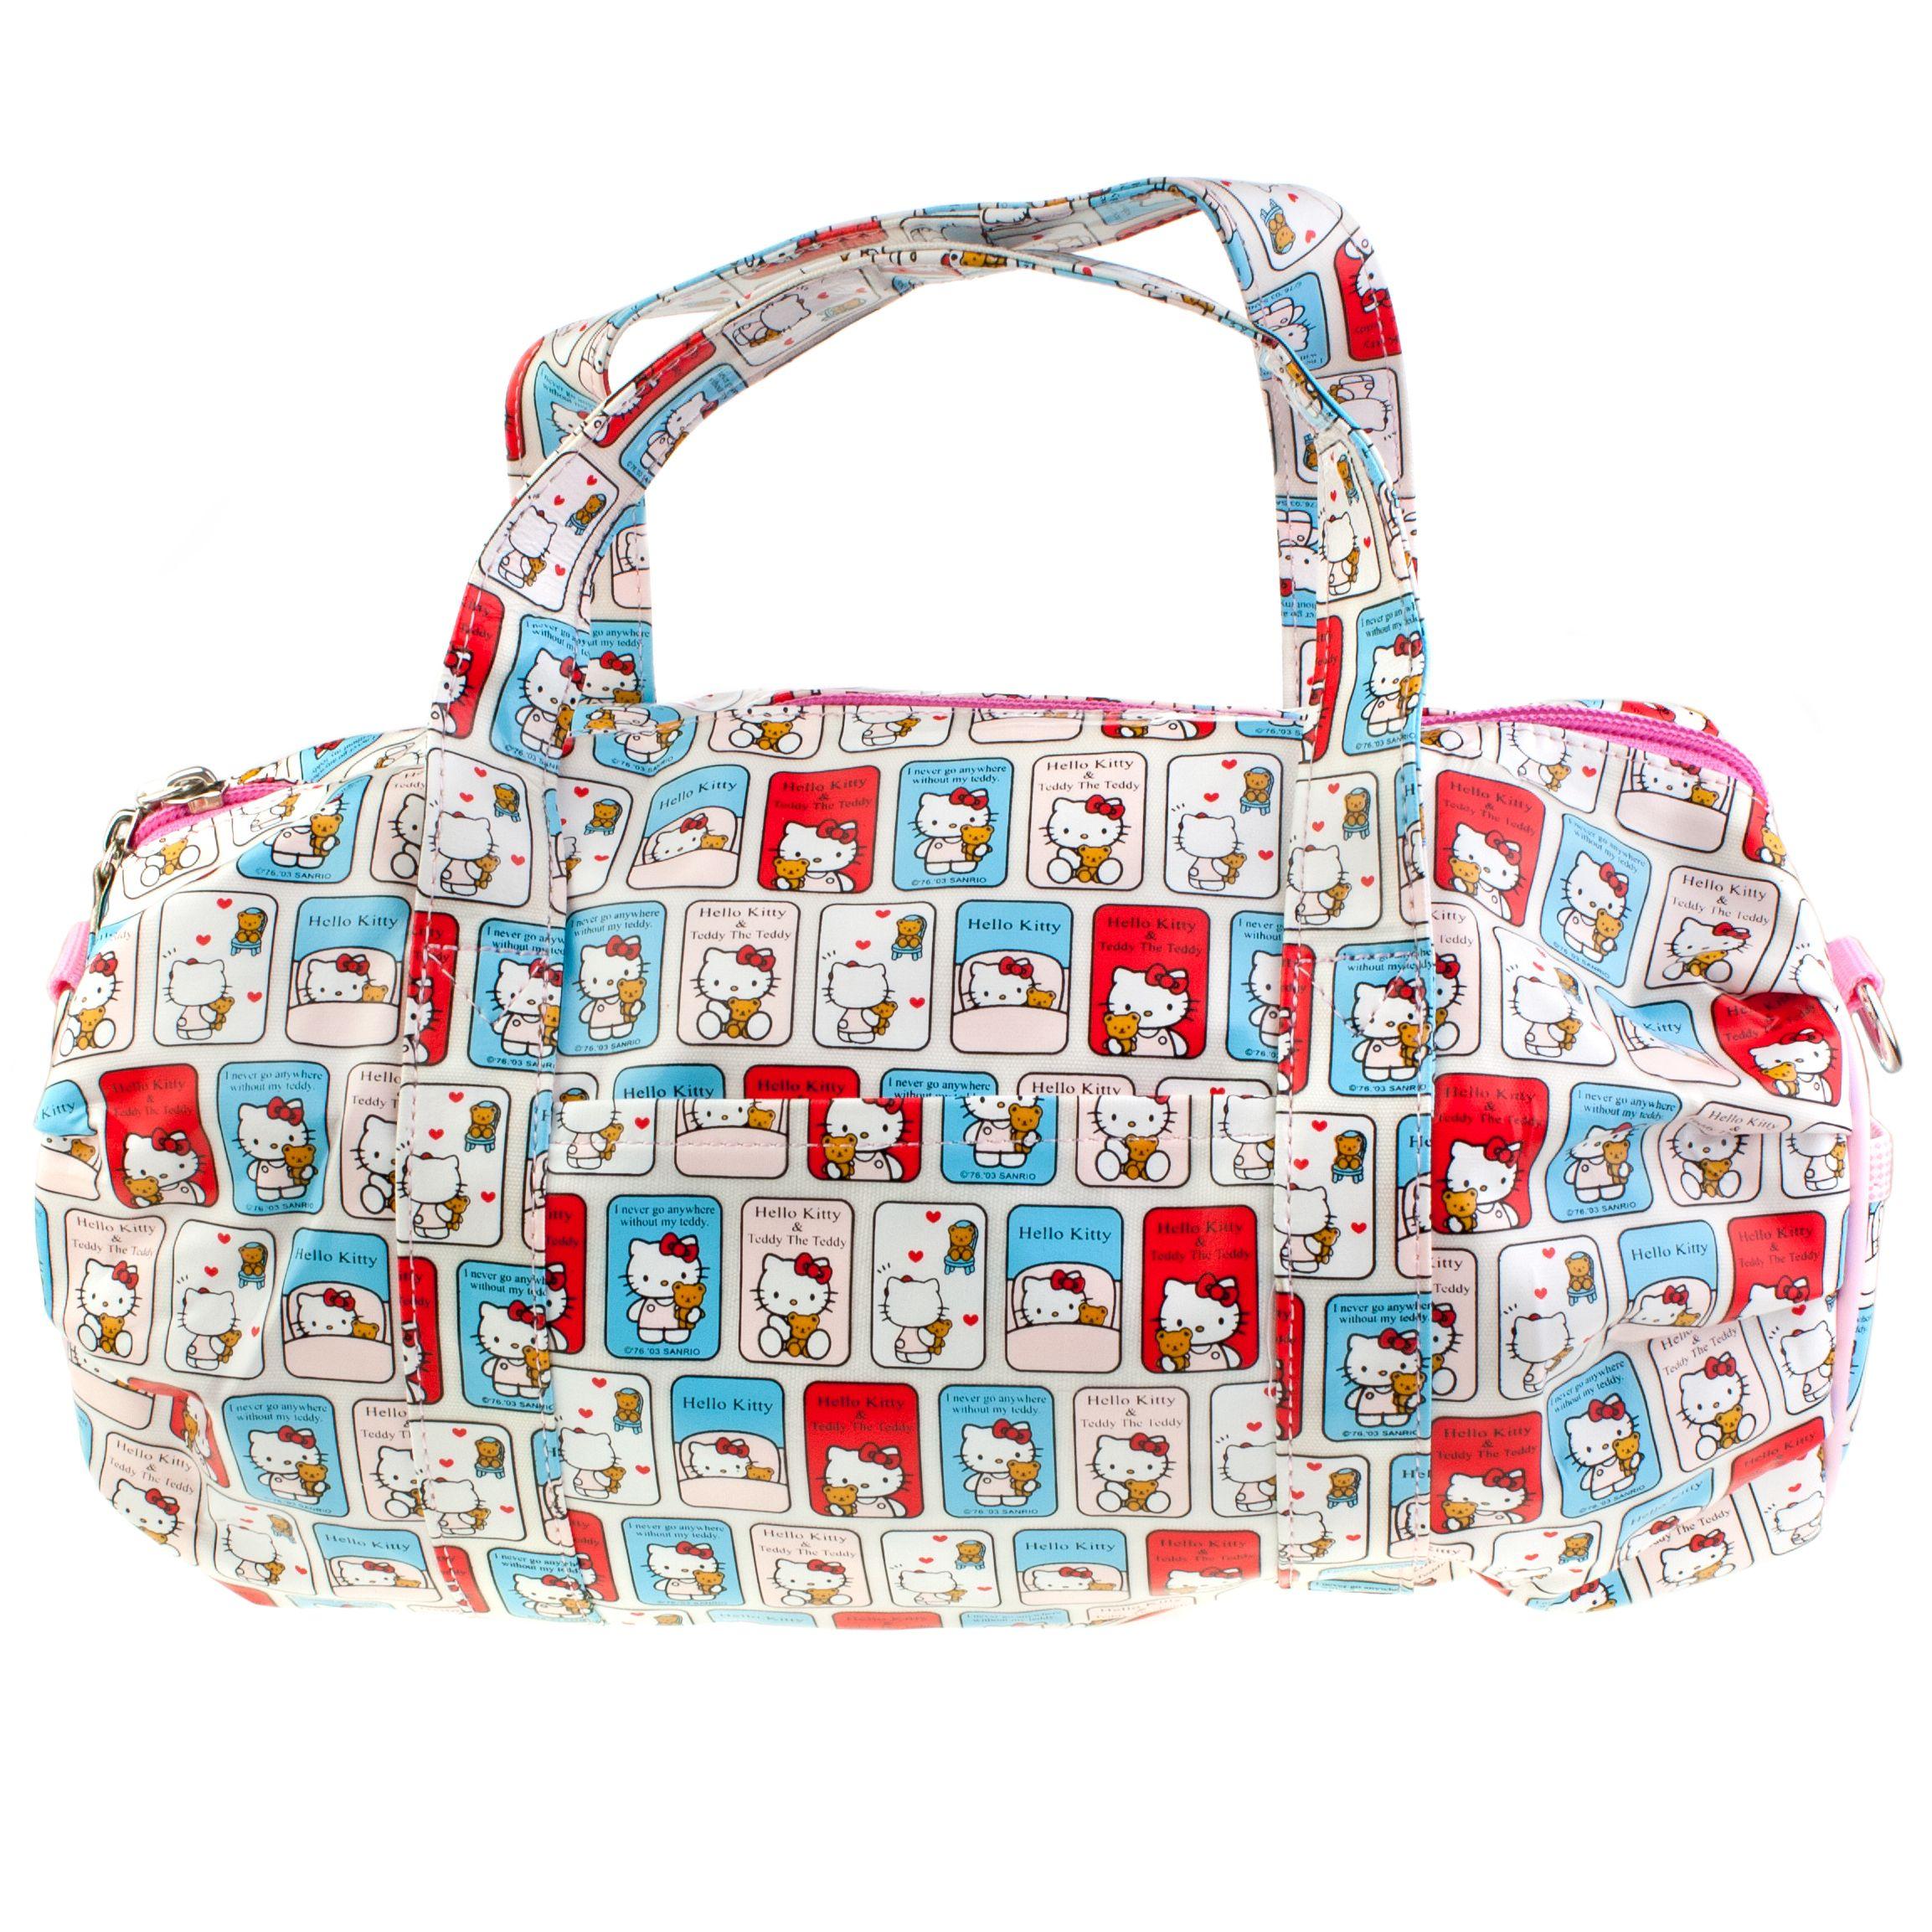 660d7b51d Hello Kitty & Teddy Cartoon Handbag #hellokitty #hellokittyuk #kawaii  #dizzypink #hellokittycollection #hellokittyaddict #hellokittystuff #bag # handbag ...